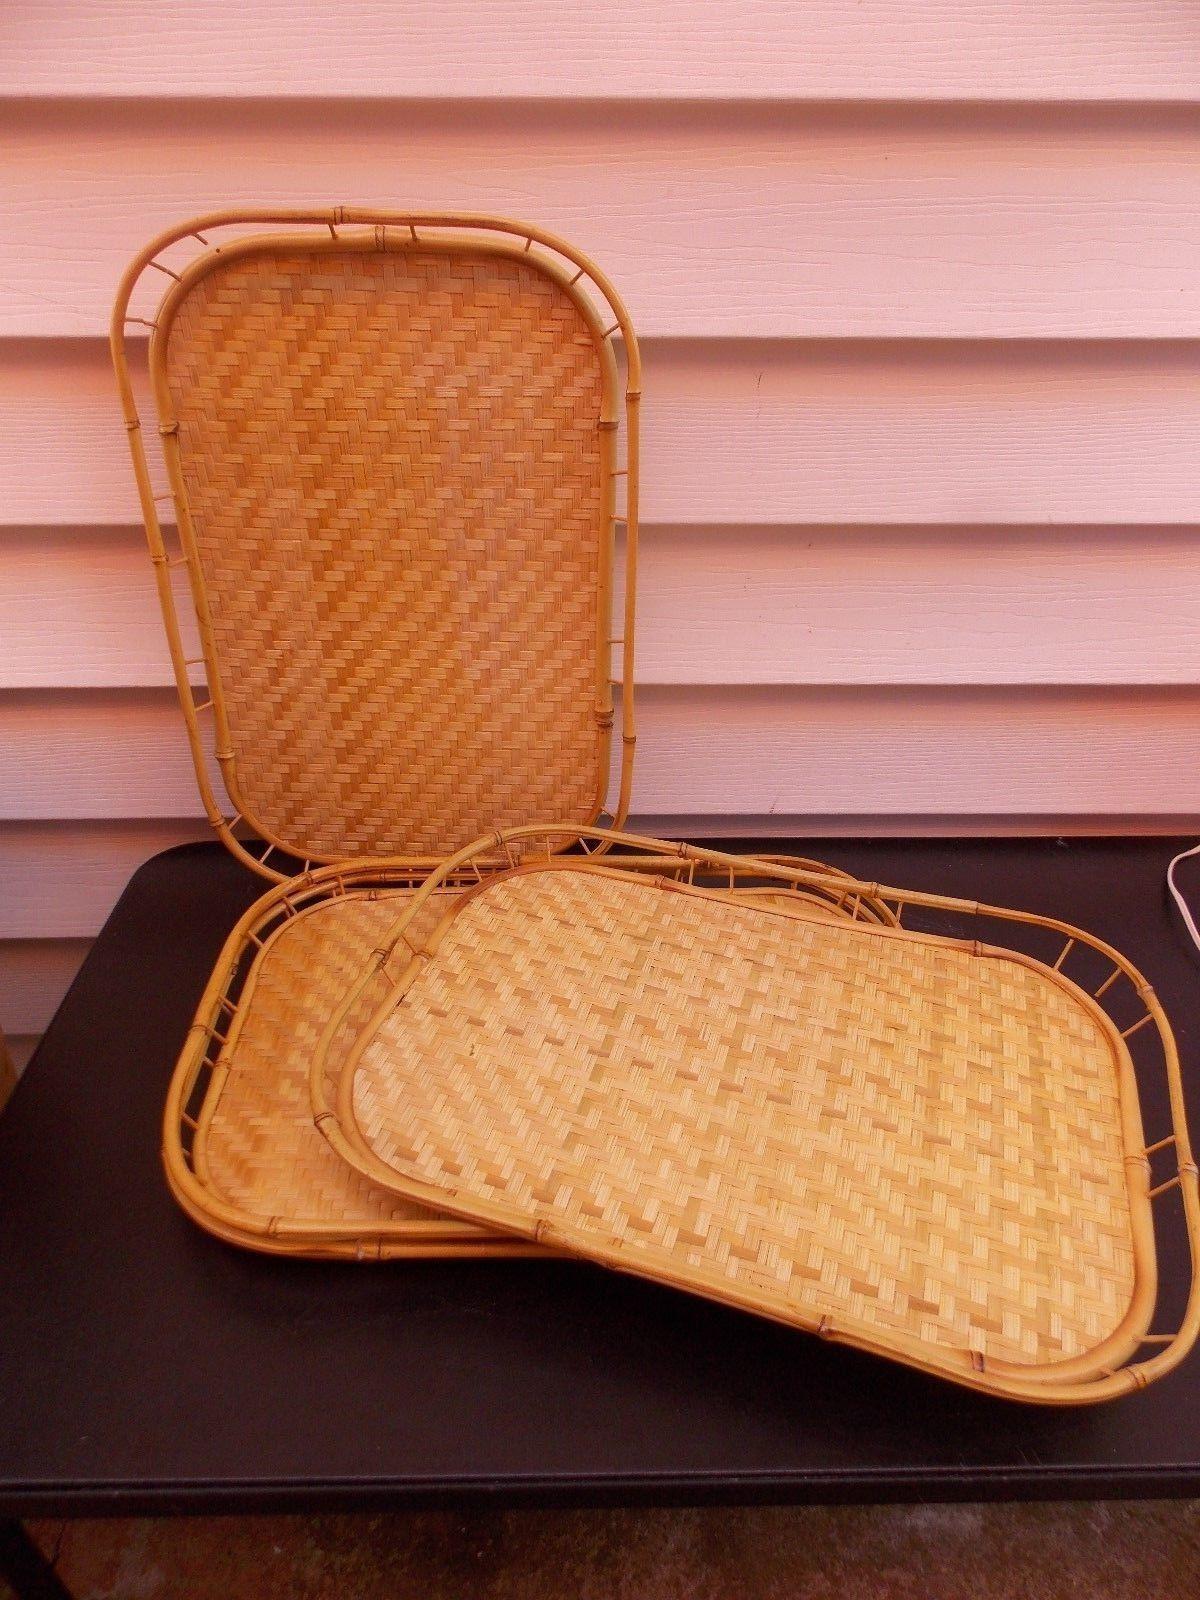 Vintage Bamboo Rattan Wicker Tiki Serving Lap Breakfast TV